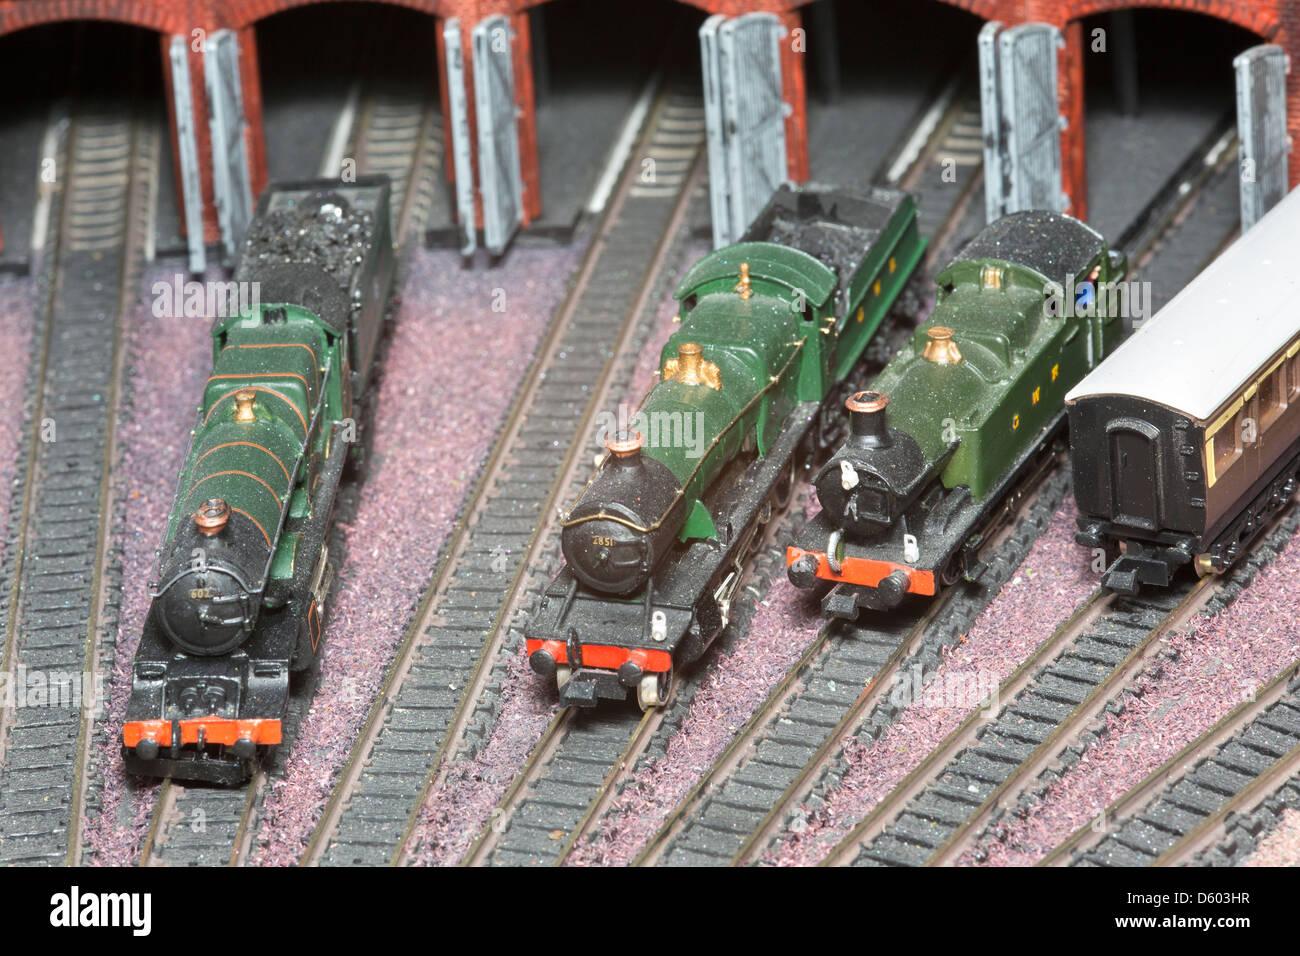 Locomotives on an 'n' gauge model railway - Stock Image